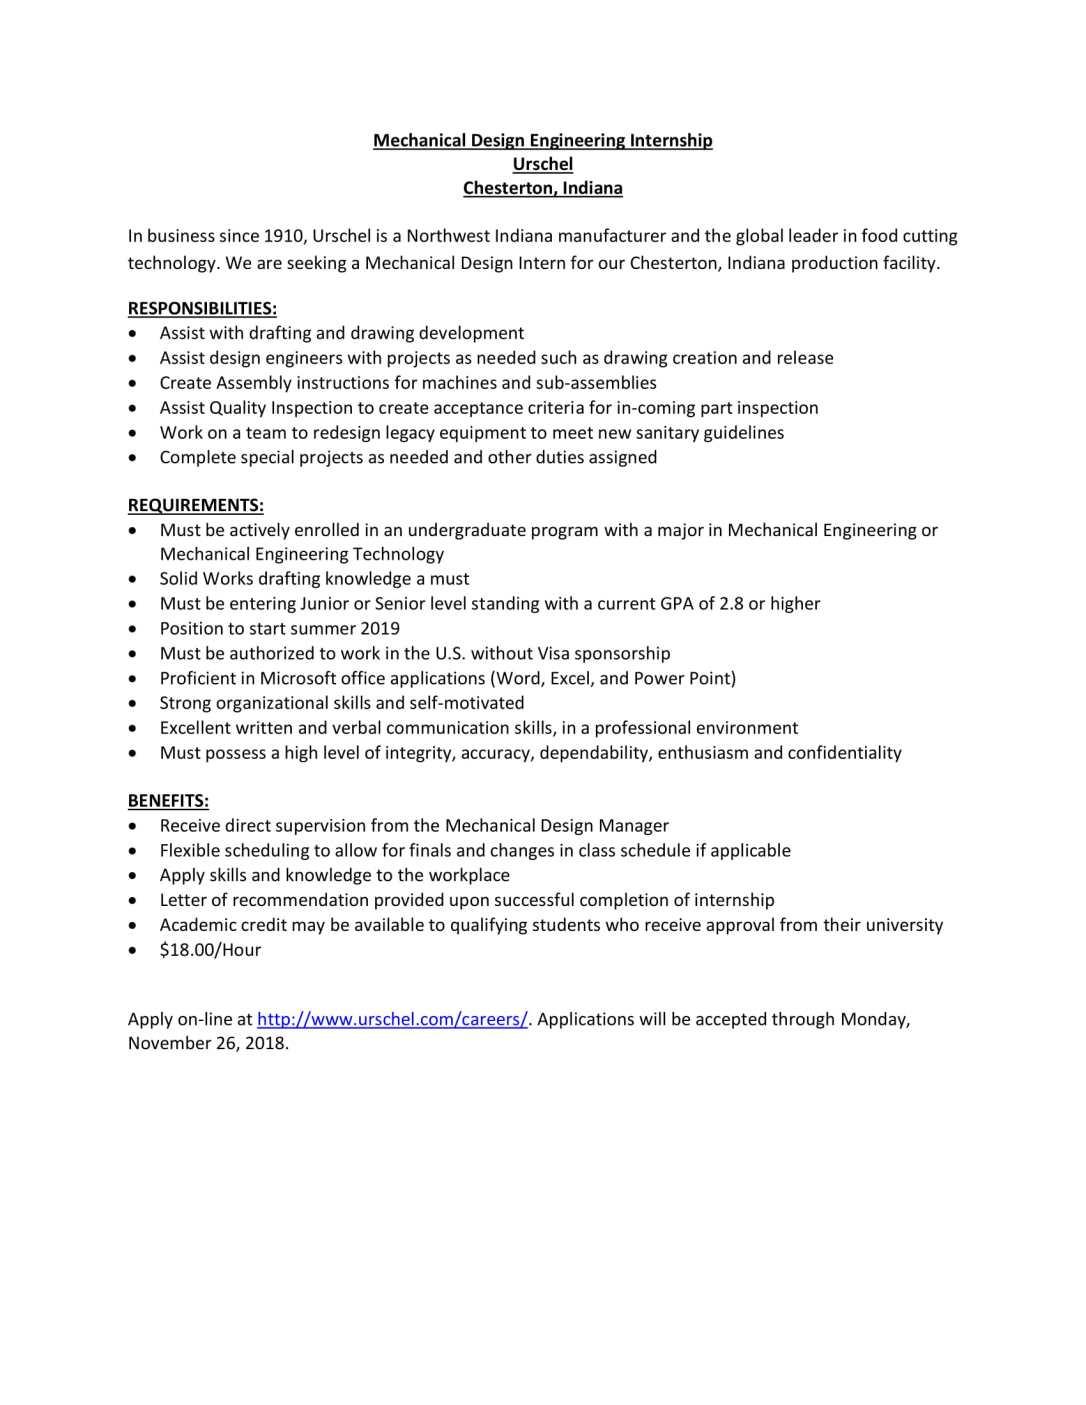 Mechanical Design Engineering Internship-1